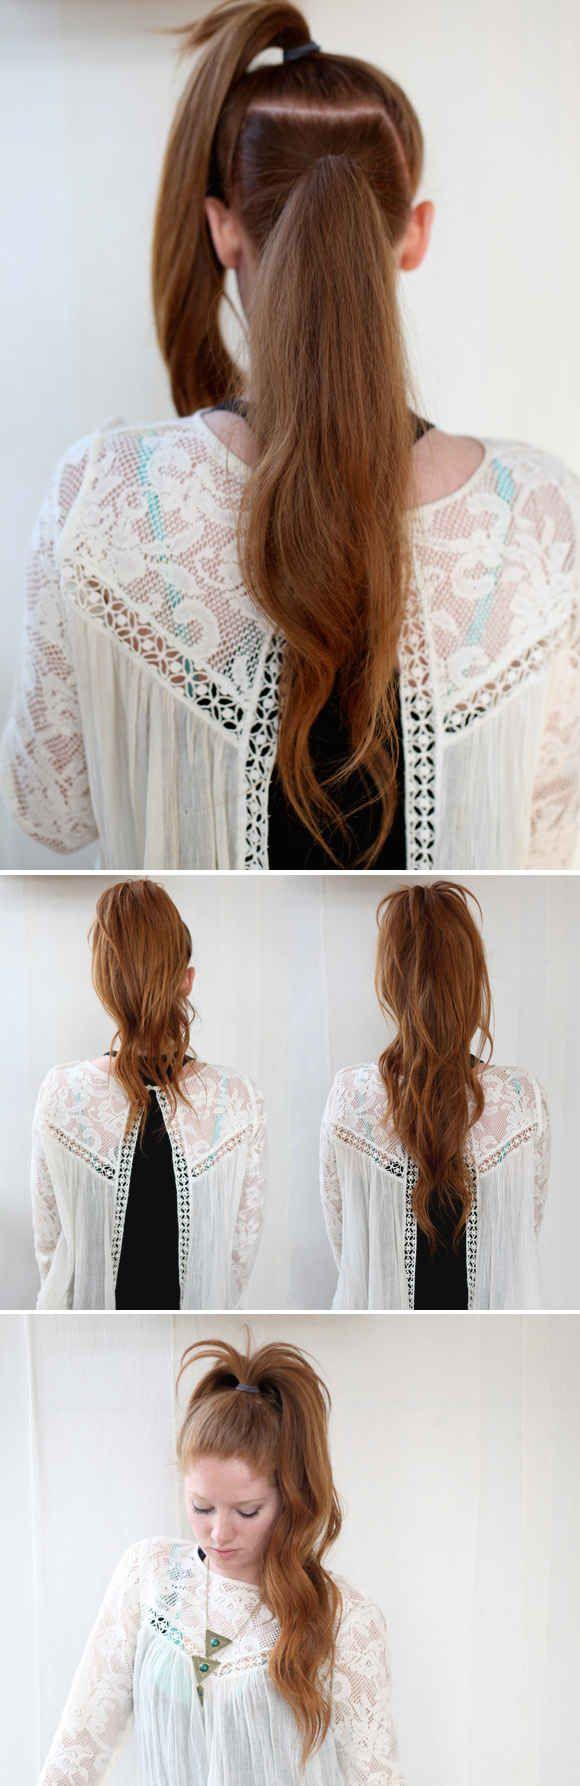 peinado mama